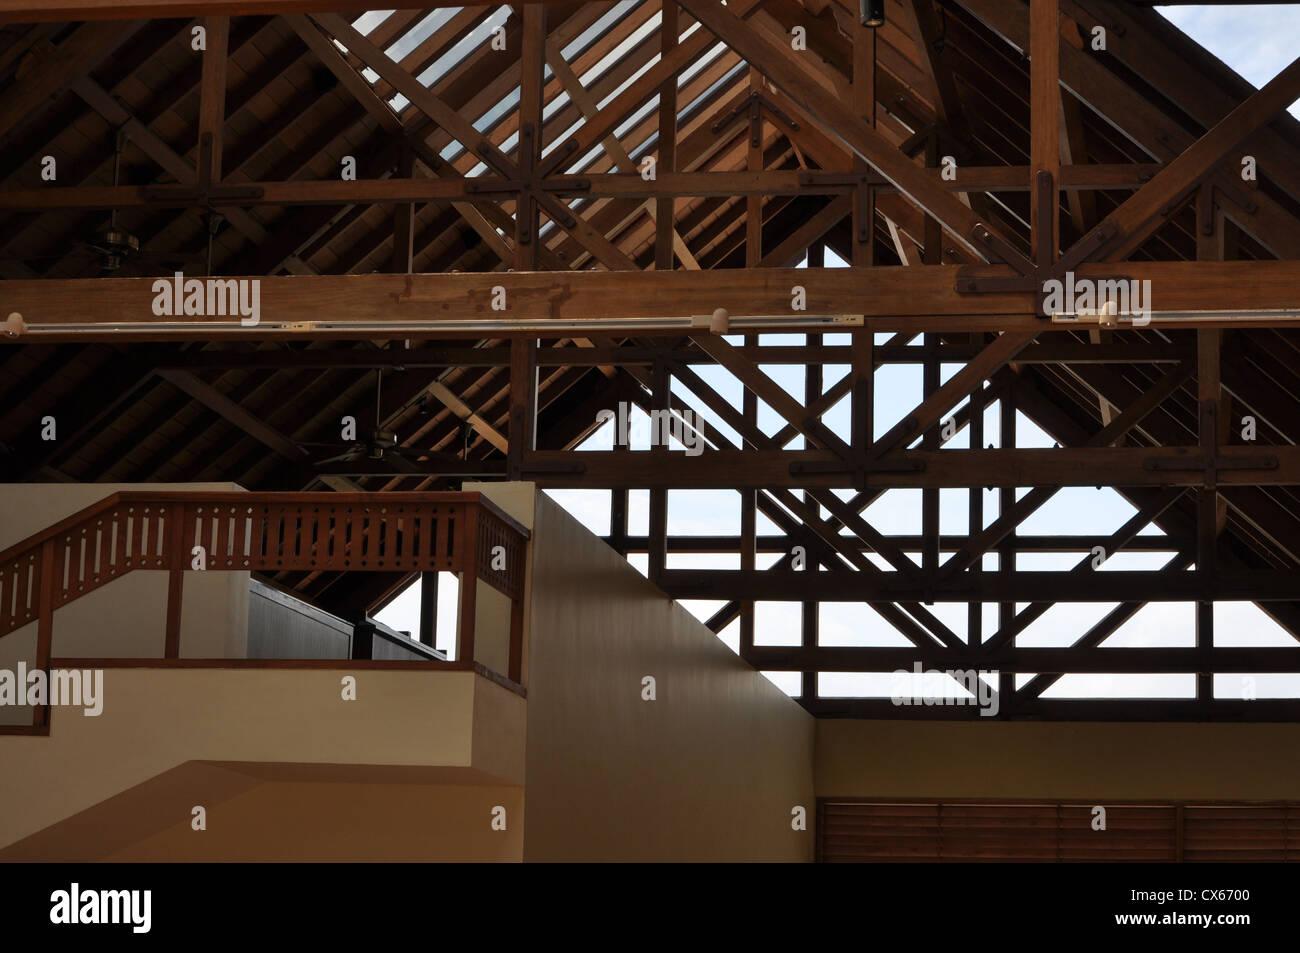 Wooden Framework Stockfotos & Wooden Framework Bilder - Alamy